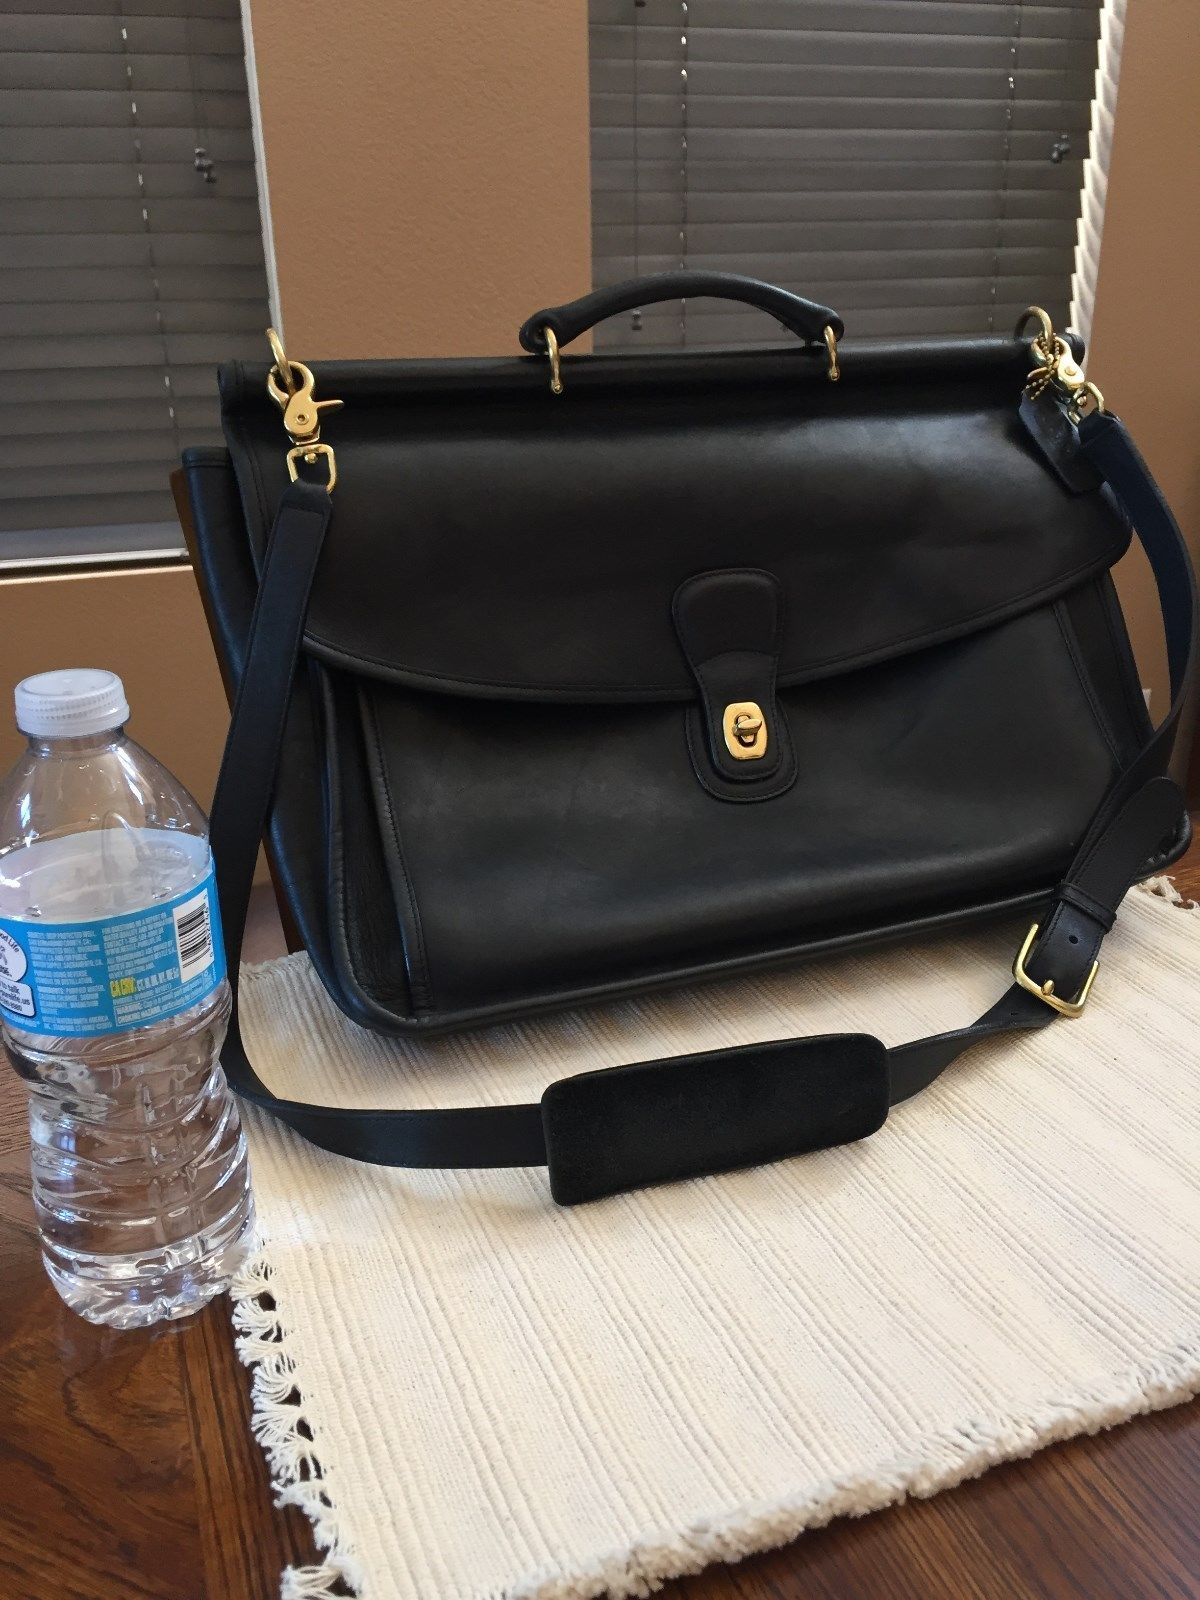 Vintage Beekman Coach Briefcase Black Leather Crossbody Messenger Bag  Briefcase